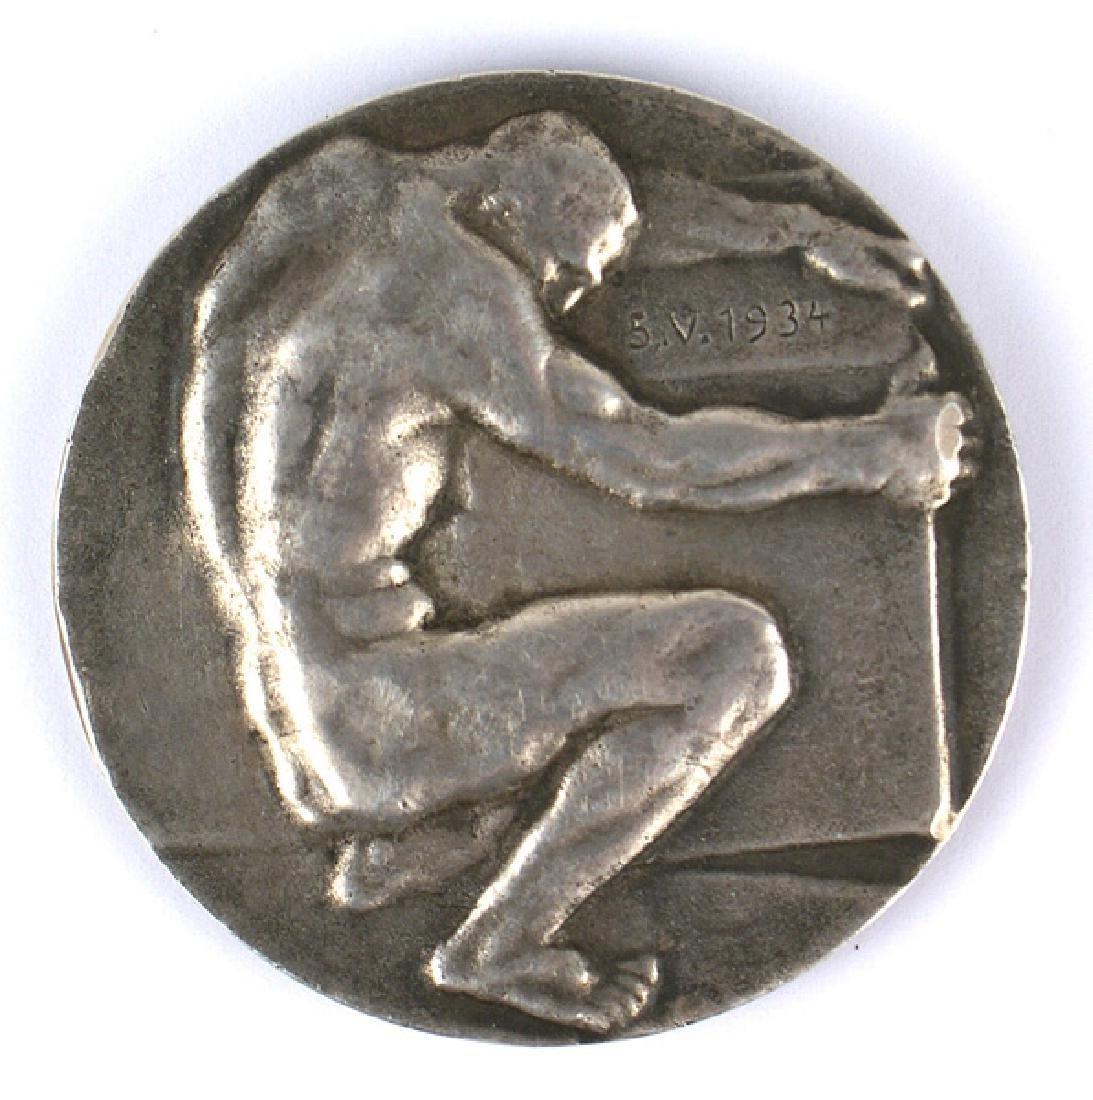 German WWII silver medal Reichs Bank Berlin - 2